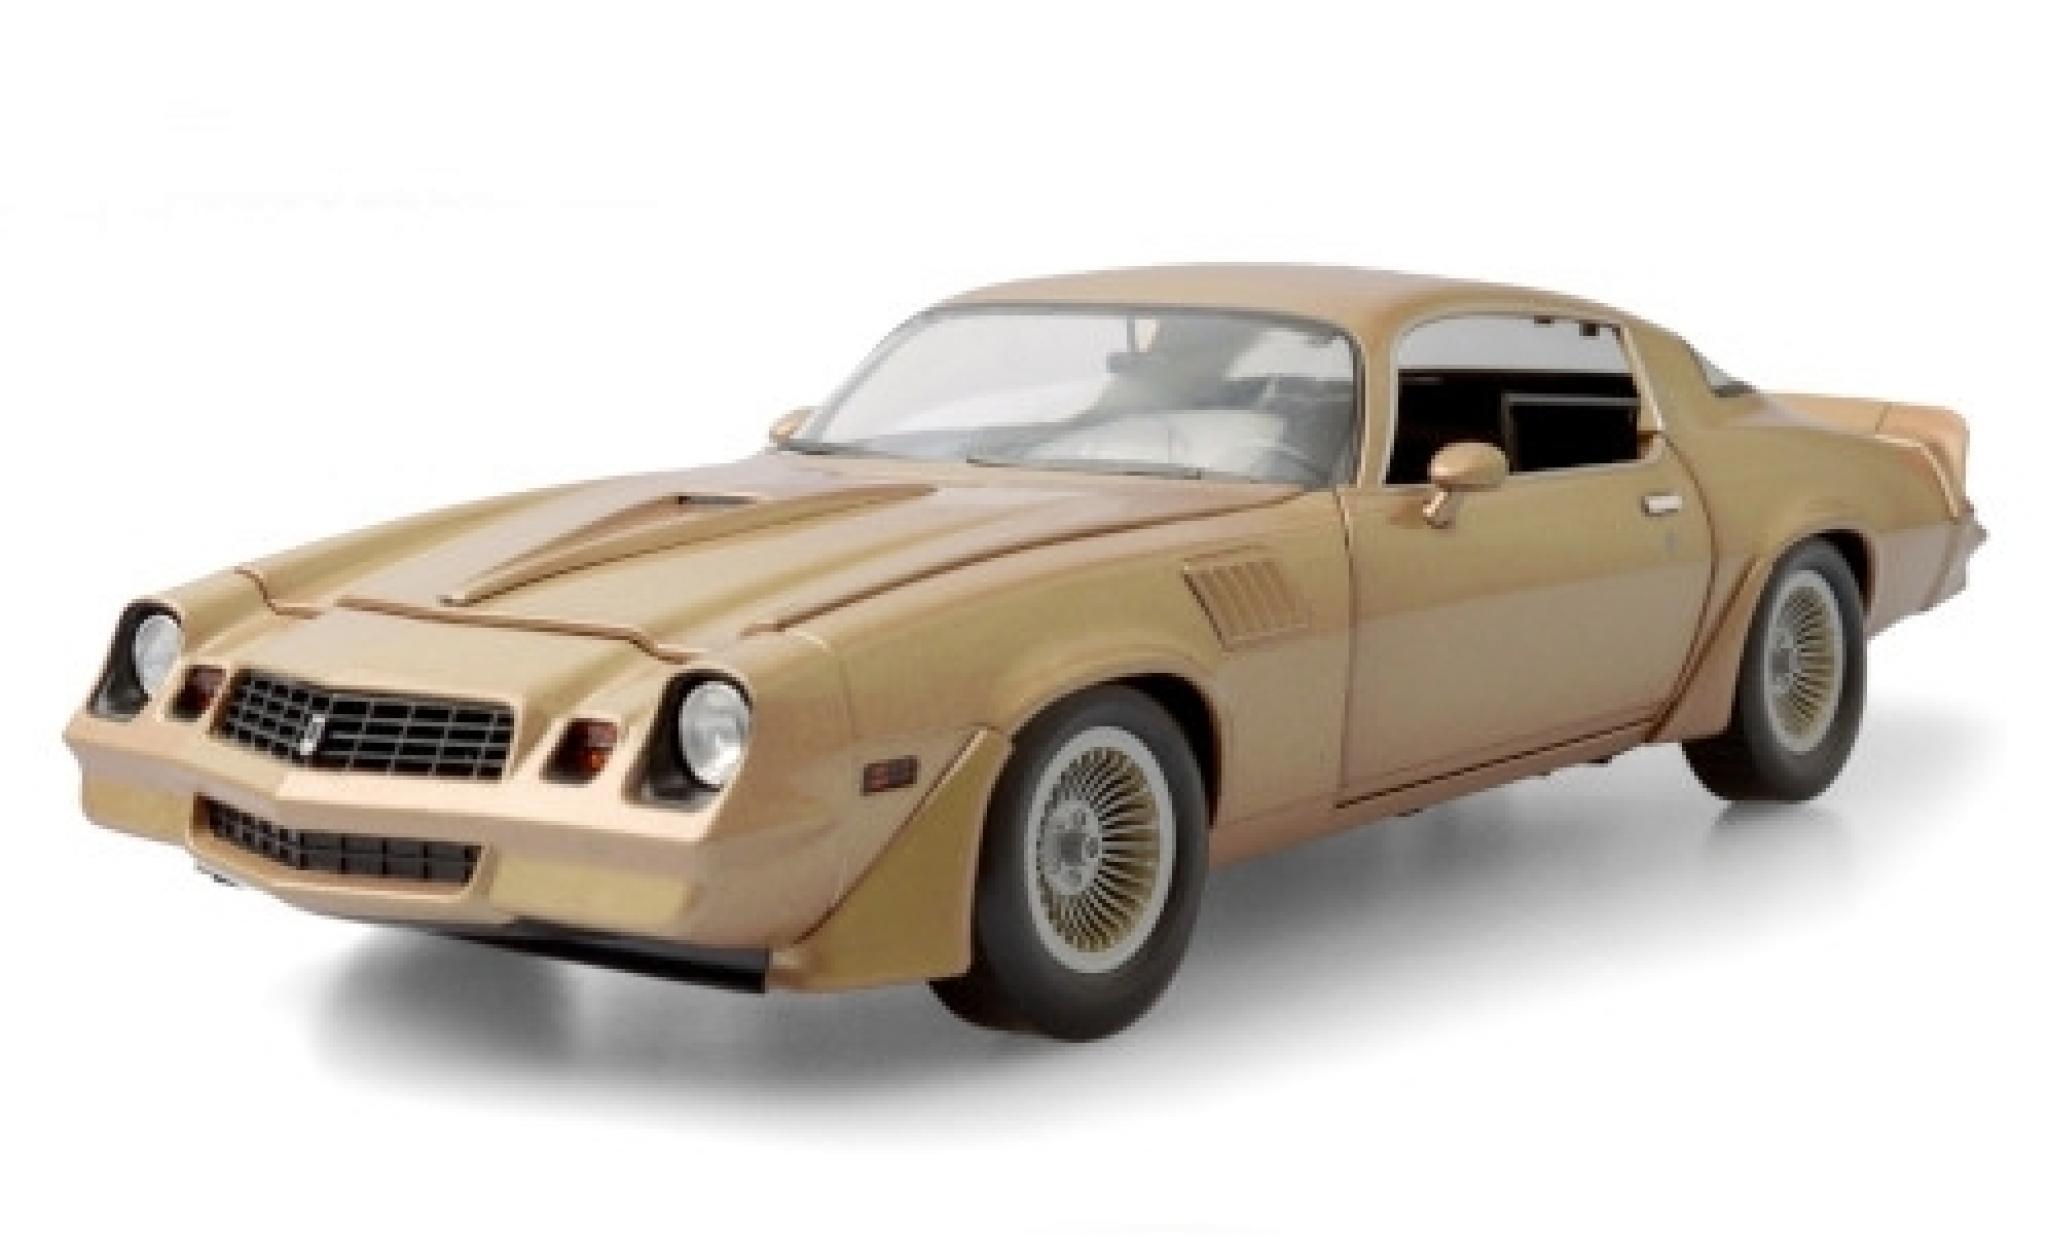 Chevrolet Camaro 1/18 Greenlight Z/28 gold Terminator 2 - Judgment Day 1979